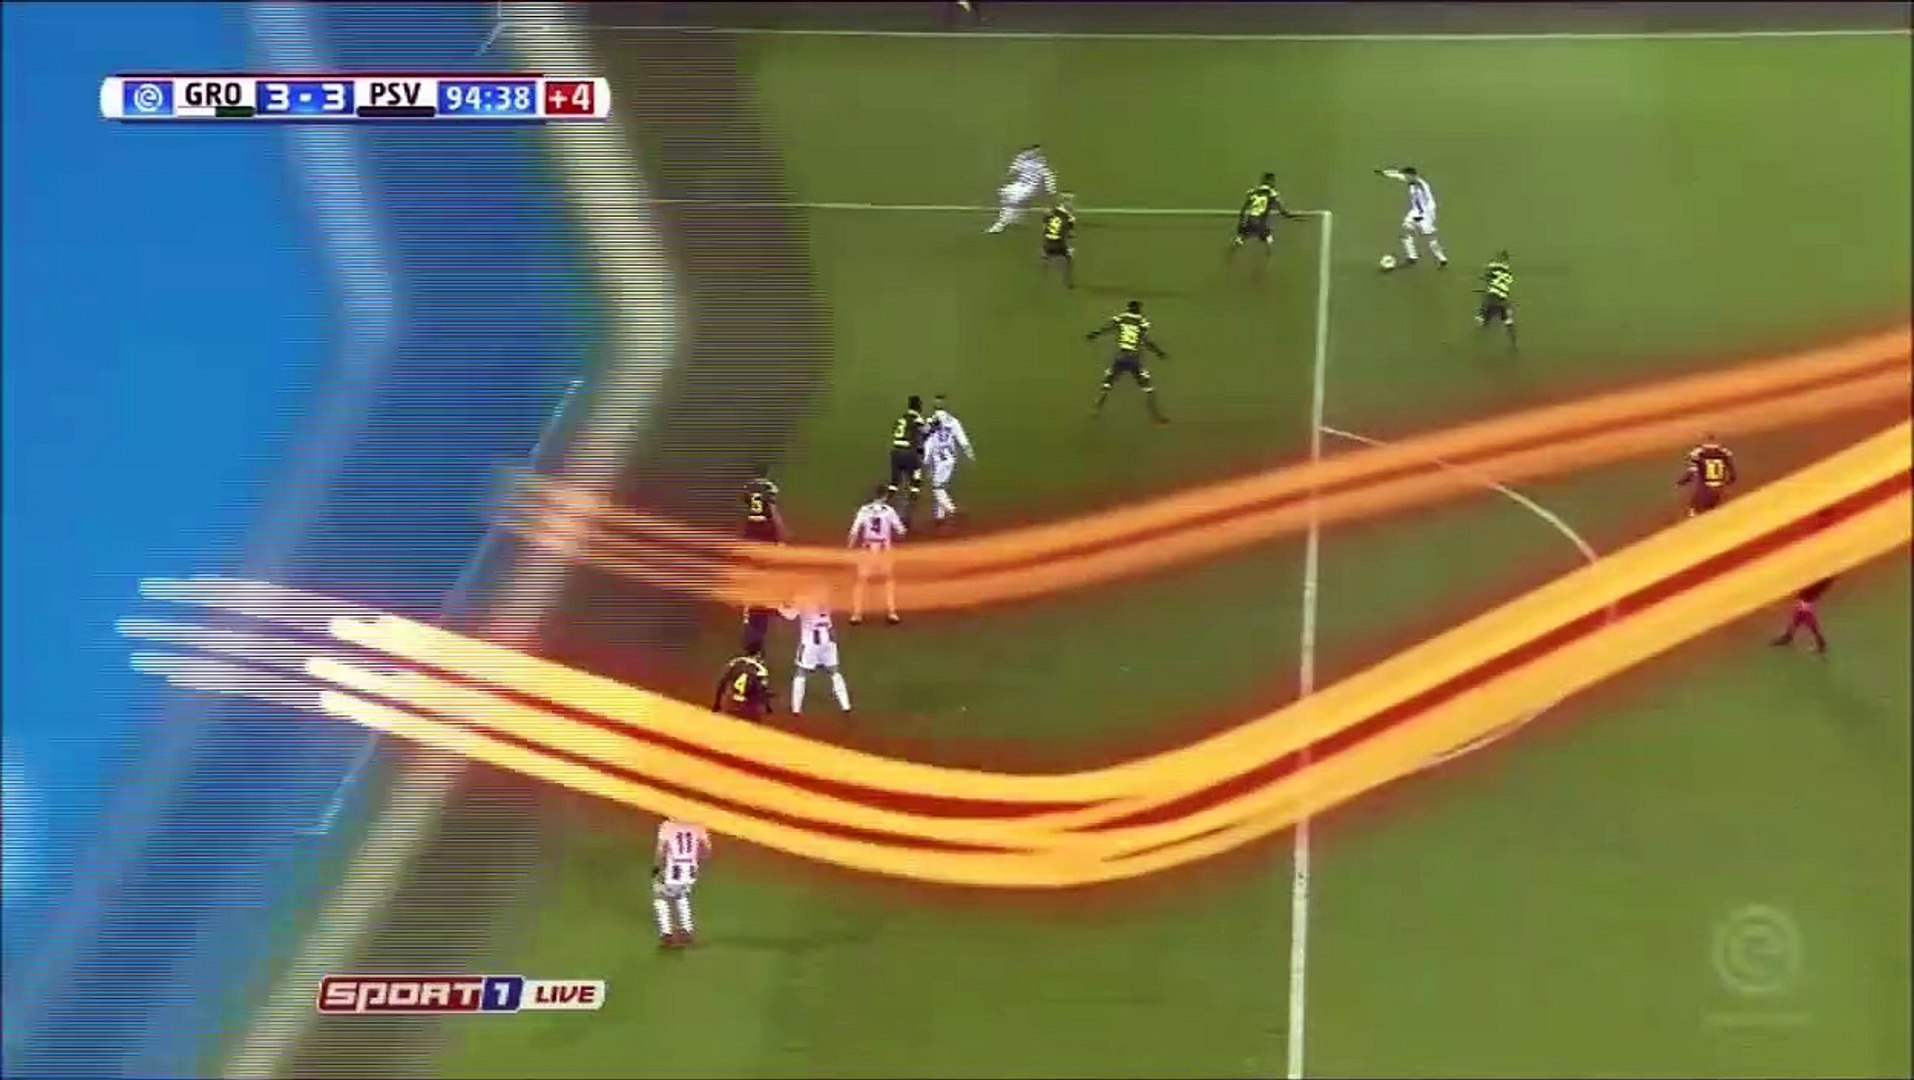 3-3 Mike te Wierik Goal Holland  Eredivisie - 13.12.2017 FC Groningen 3-3 PSV Eindhoven